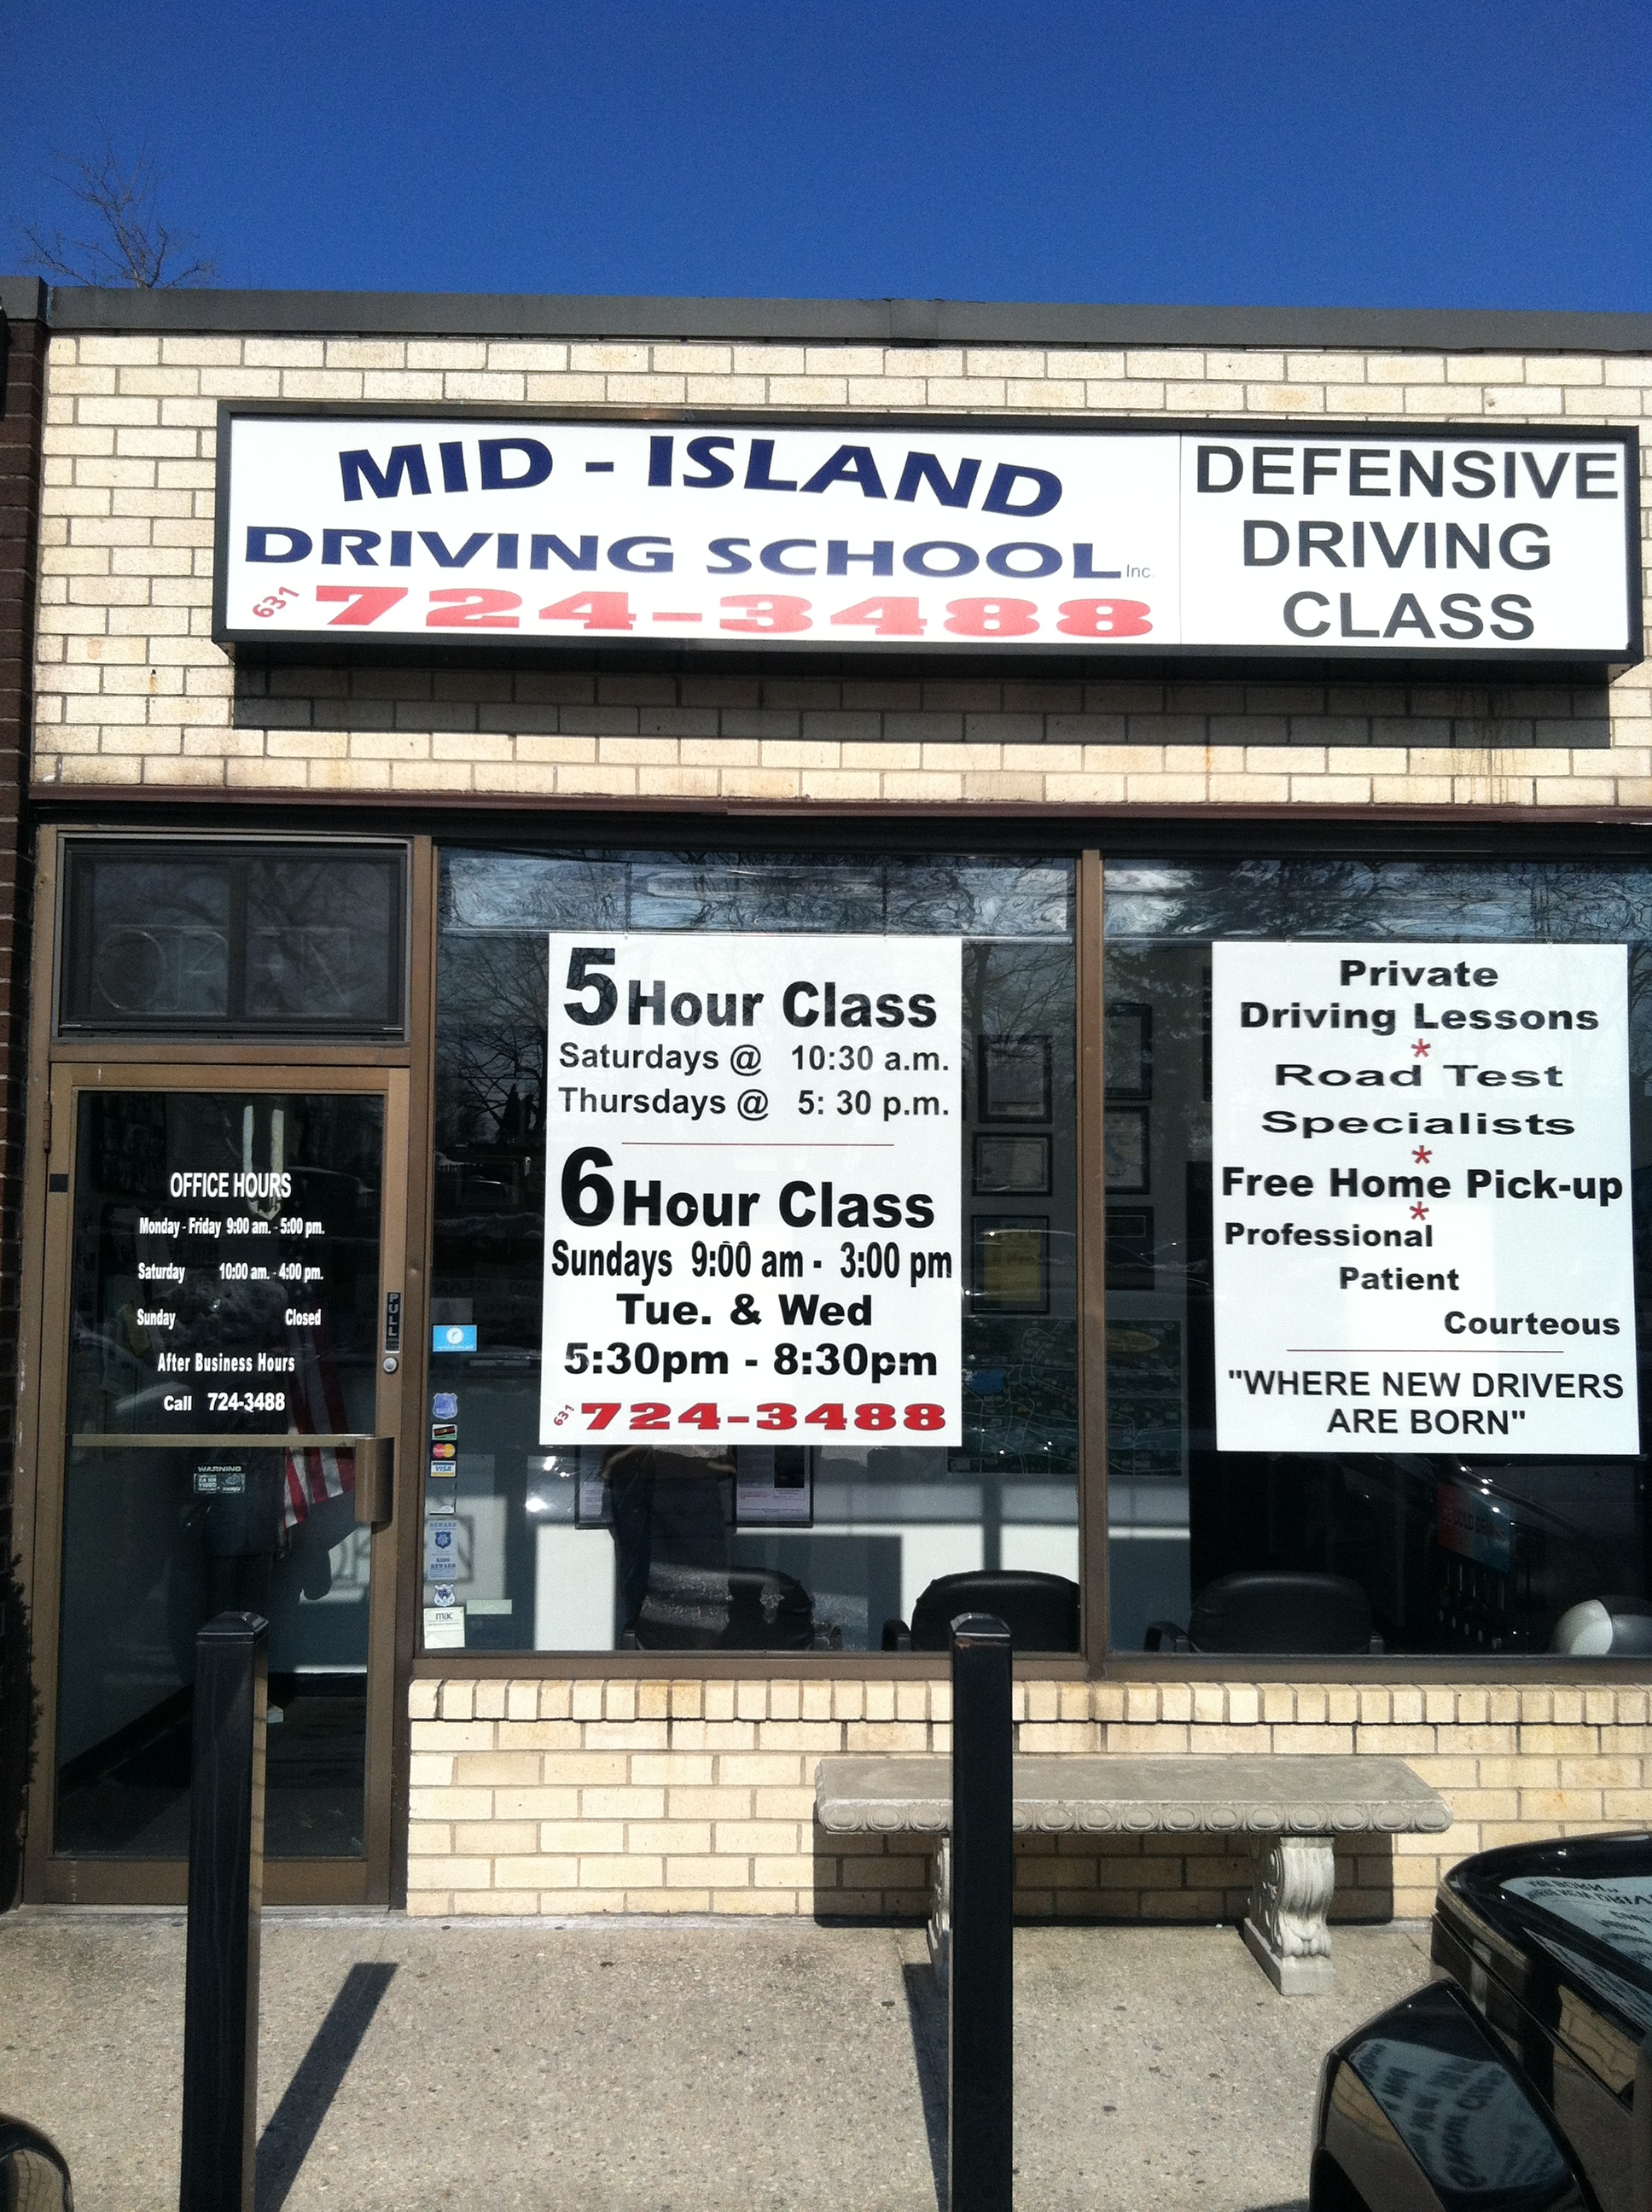 Mid Island Driving School 323 Smithtown Blvd Ronkonkoma Ny 11779